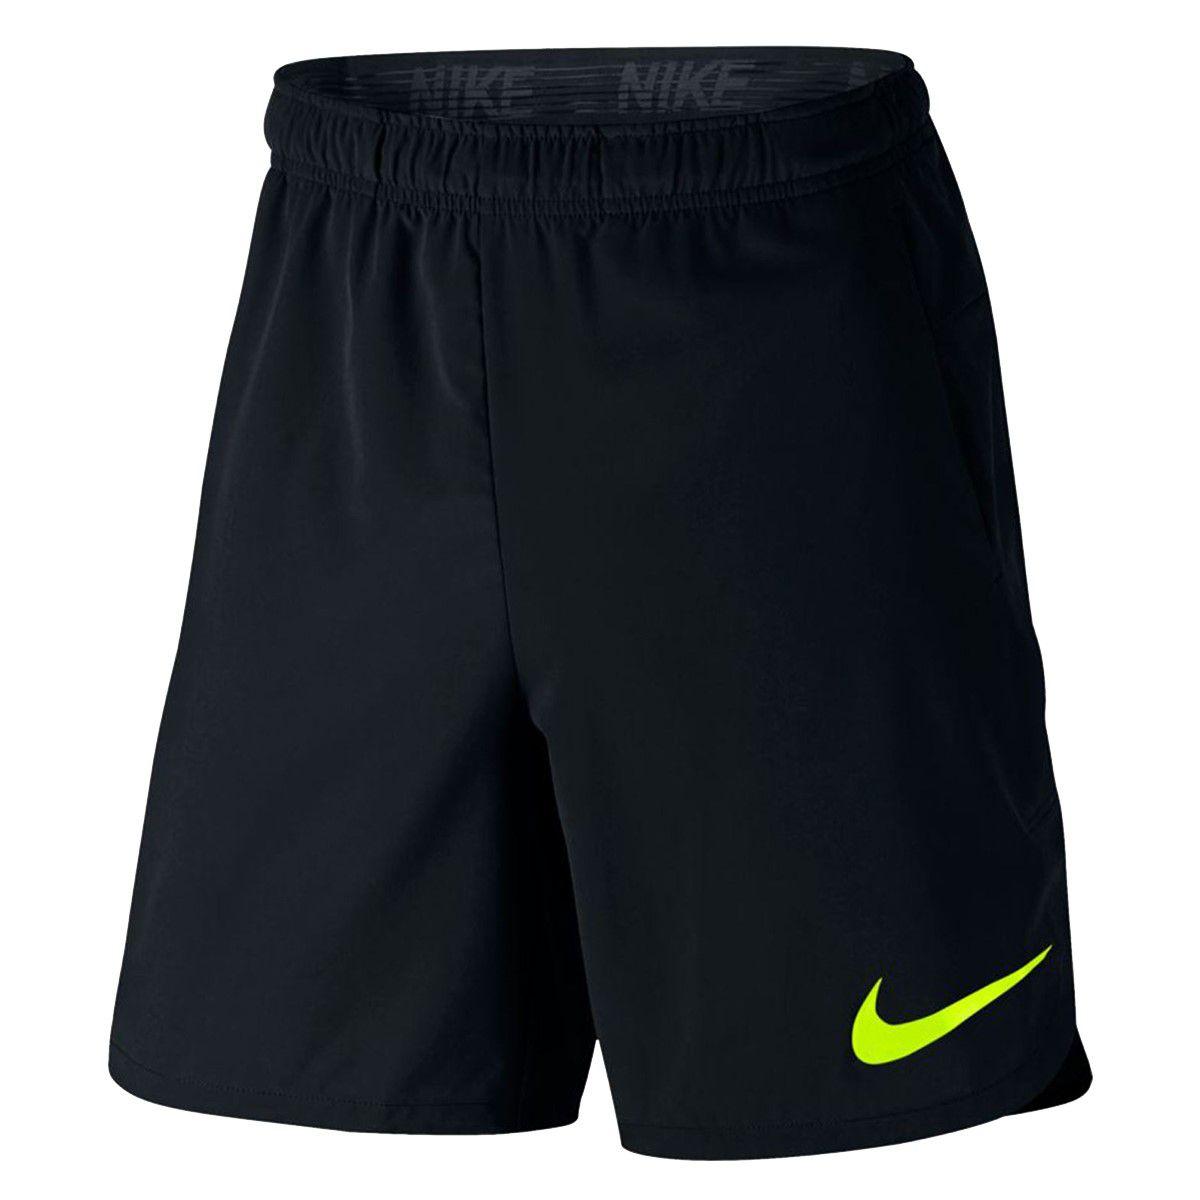 Nike Vent Max Şort 833374010